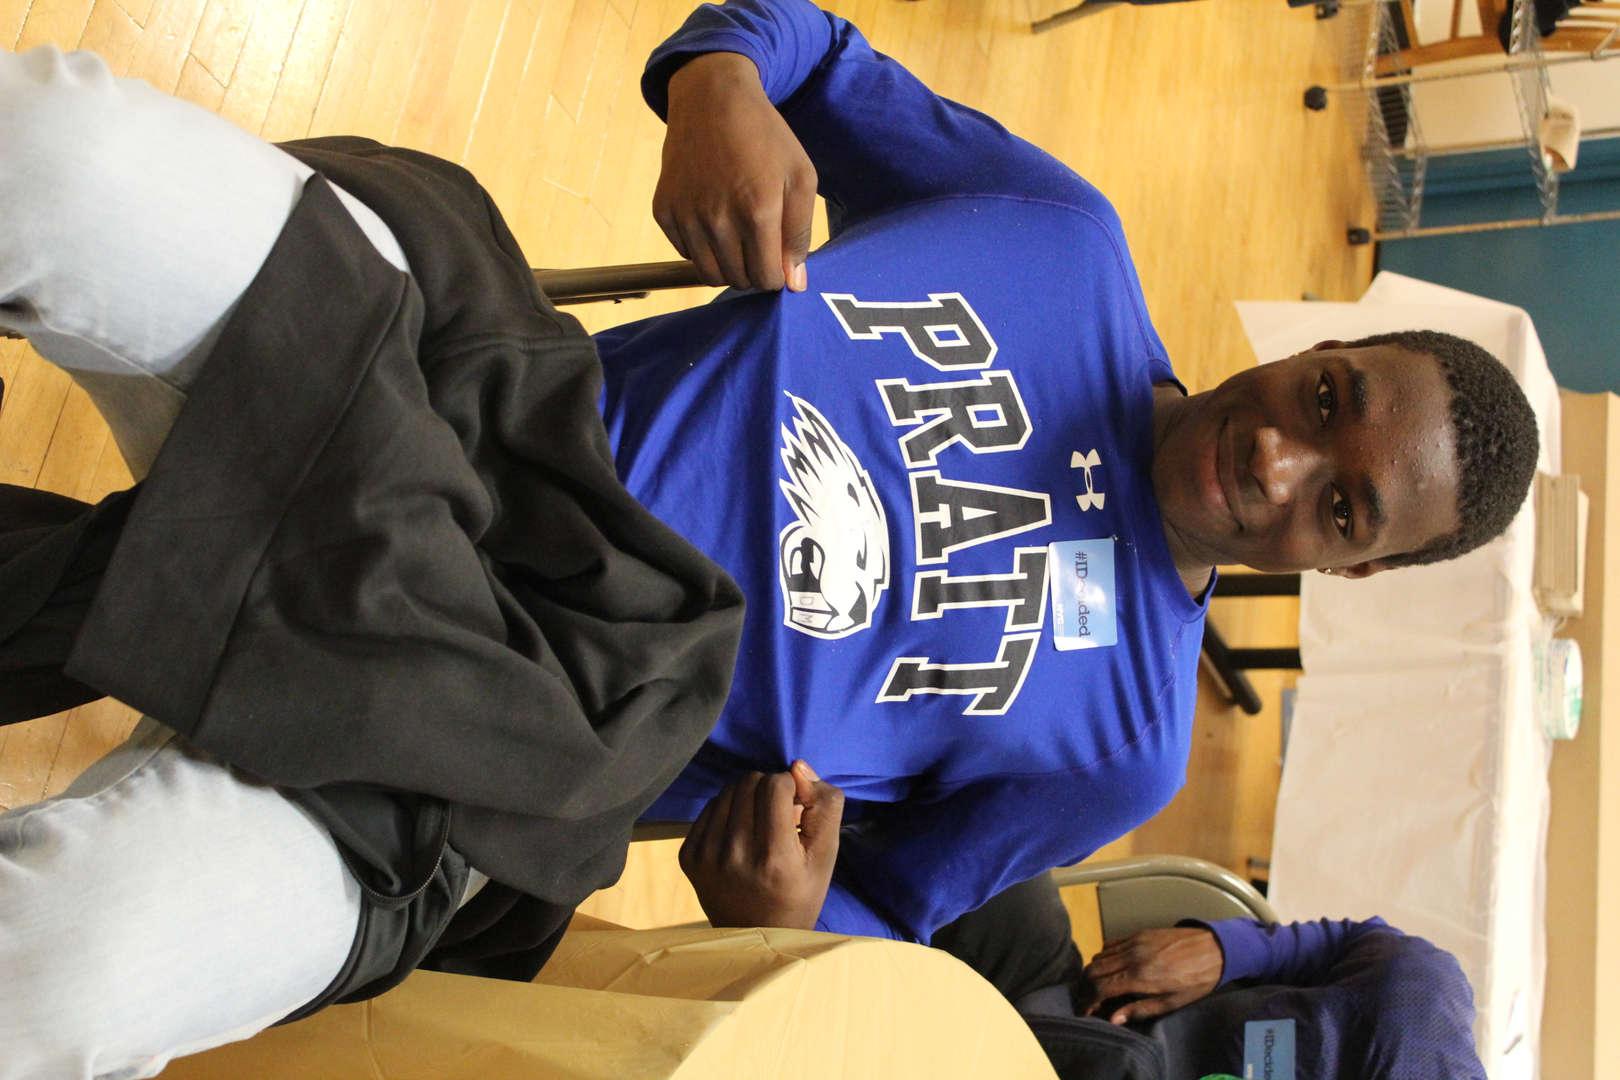 Student posing jersey shirt